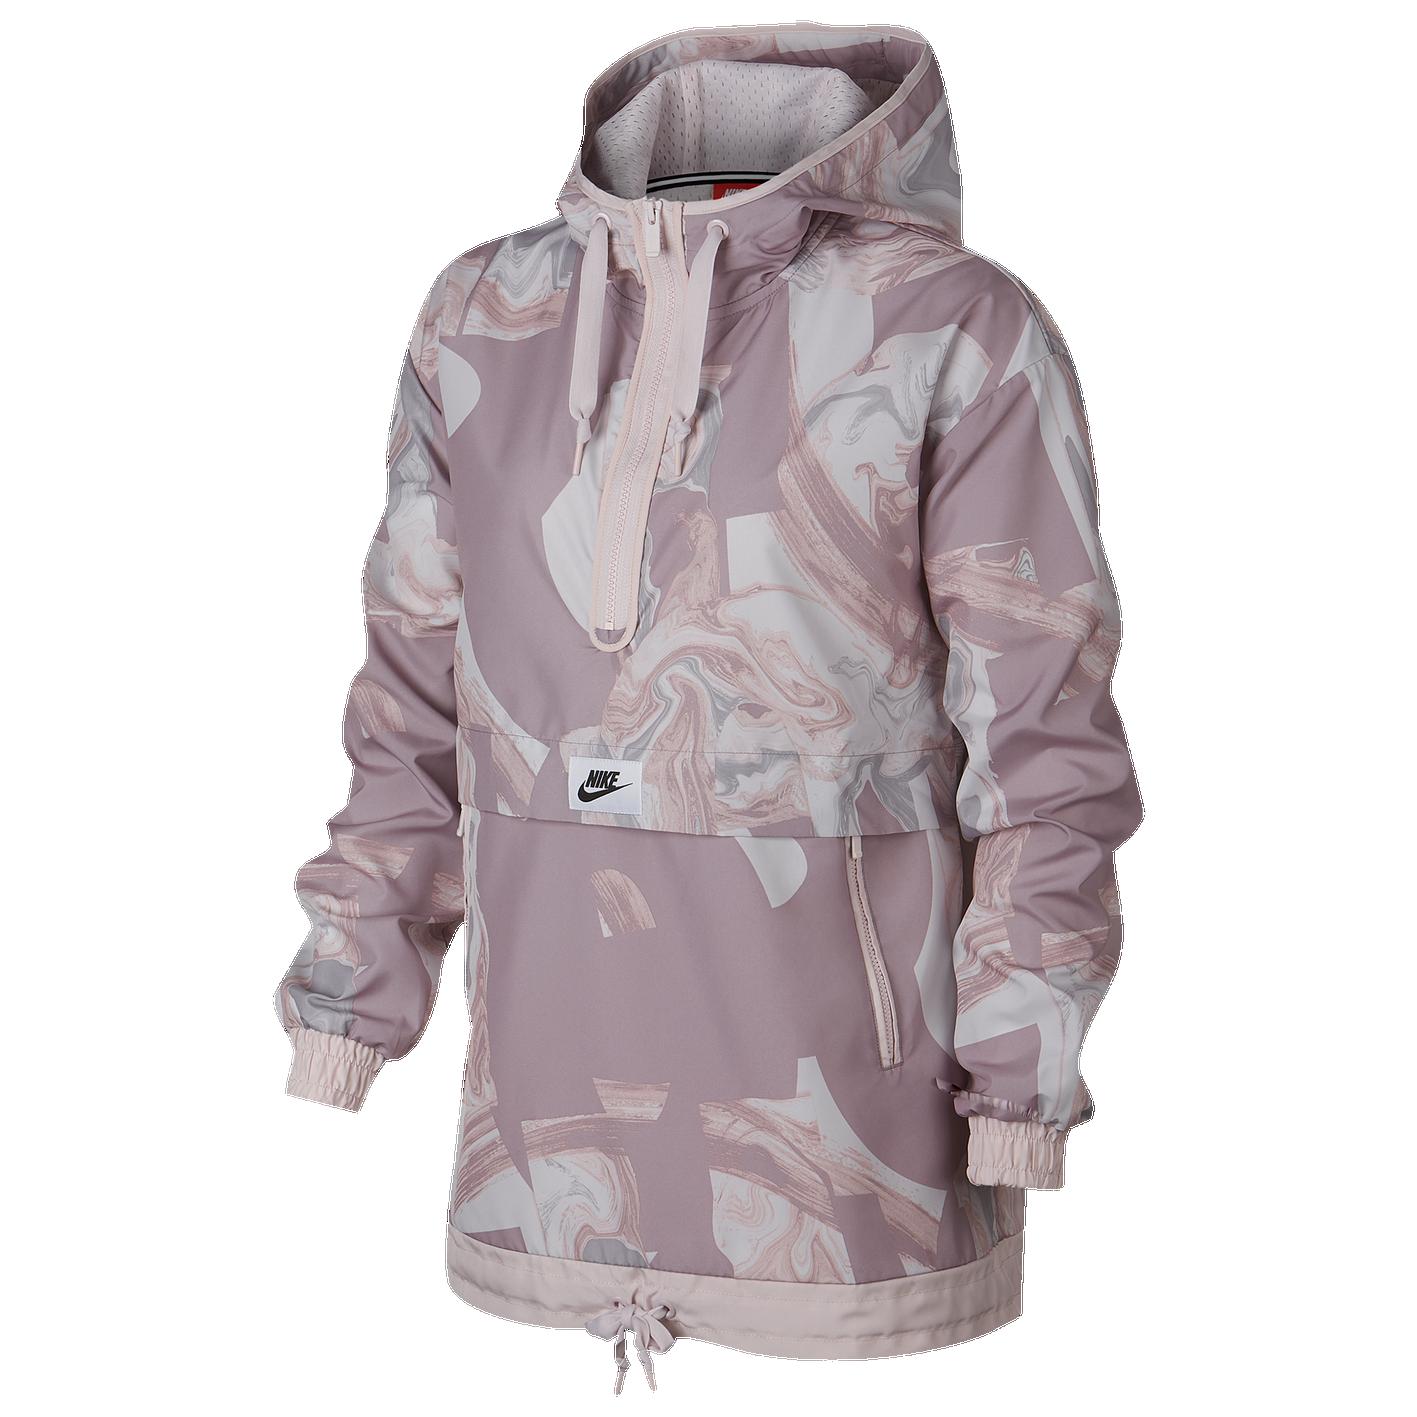 78e1fe65b4 Nike Marble Half-Zip Jacket - Women s - Casual - Clothing ...